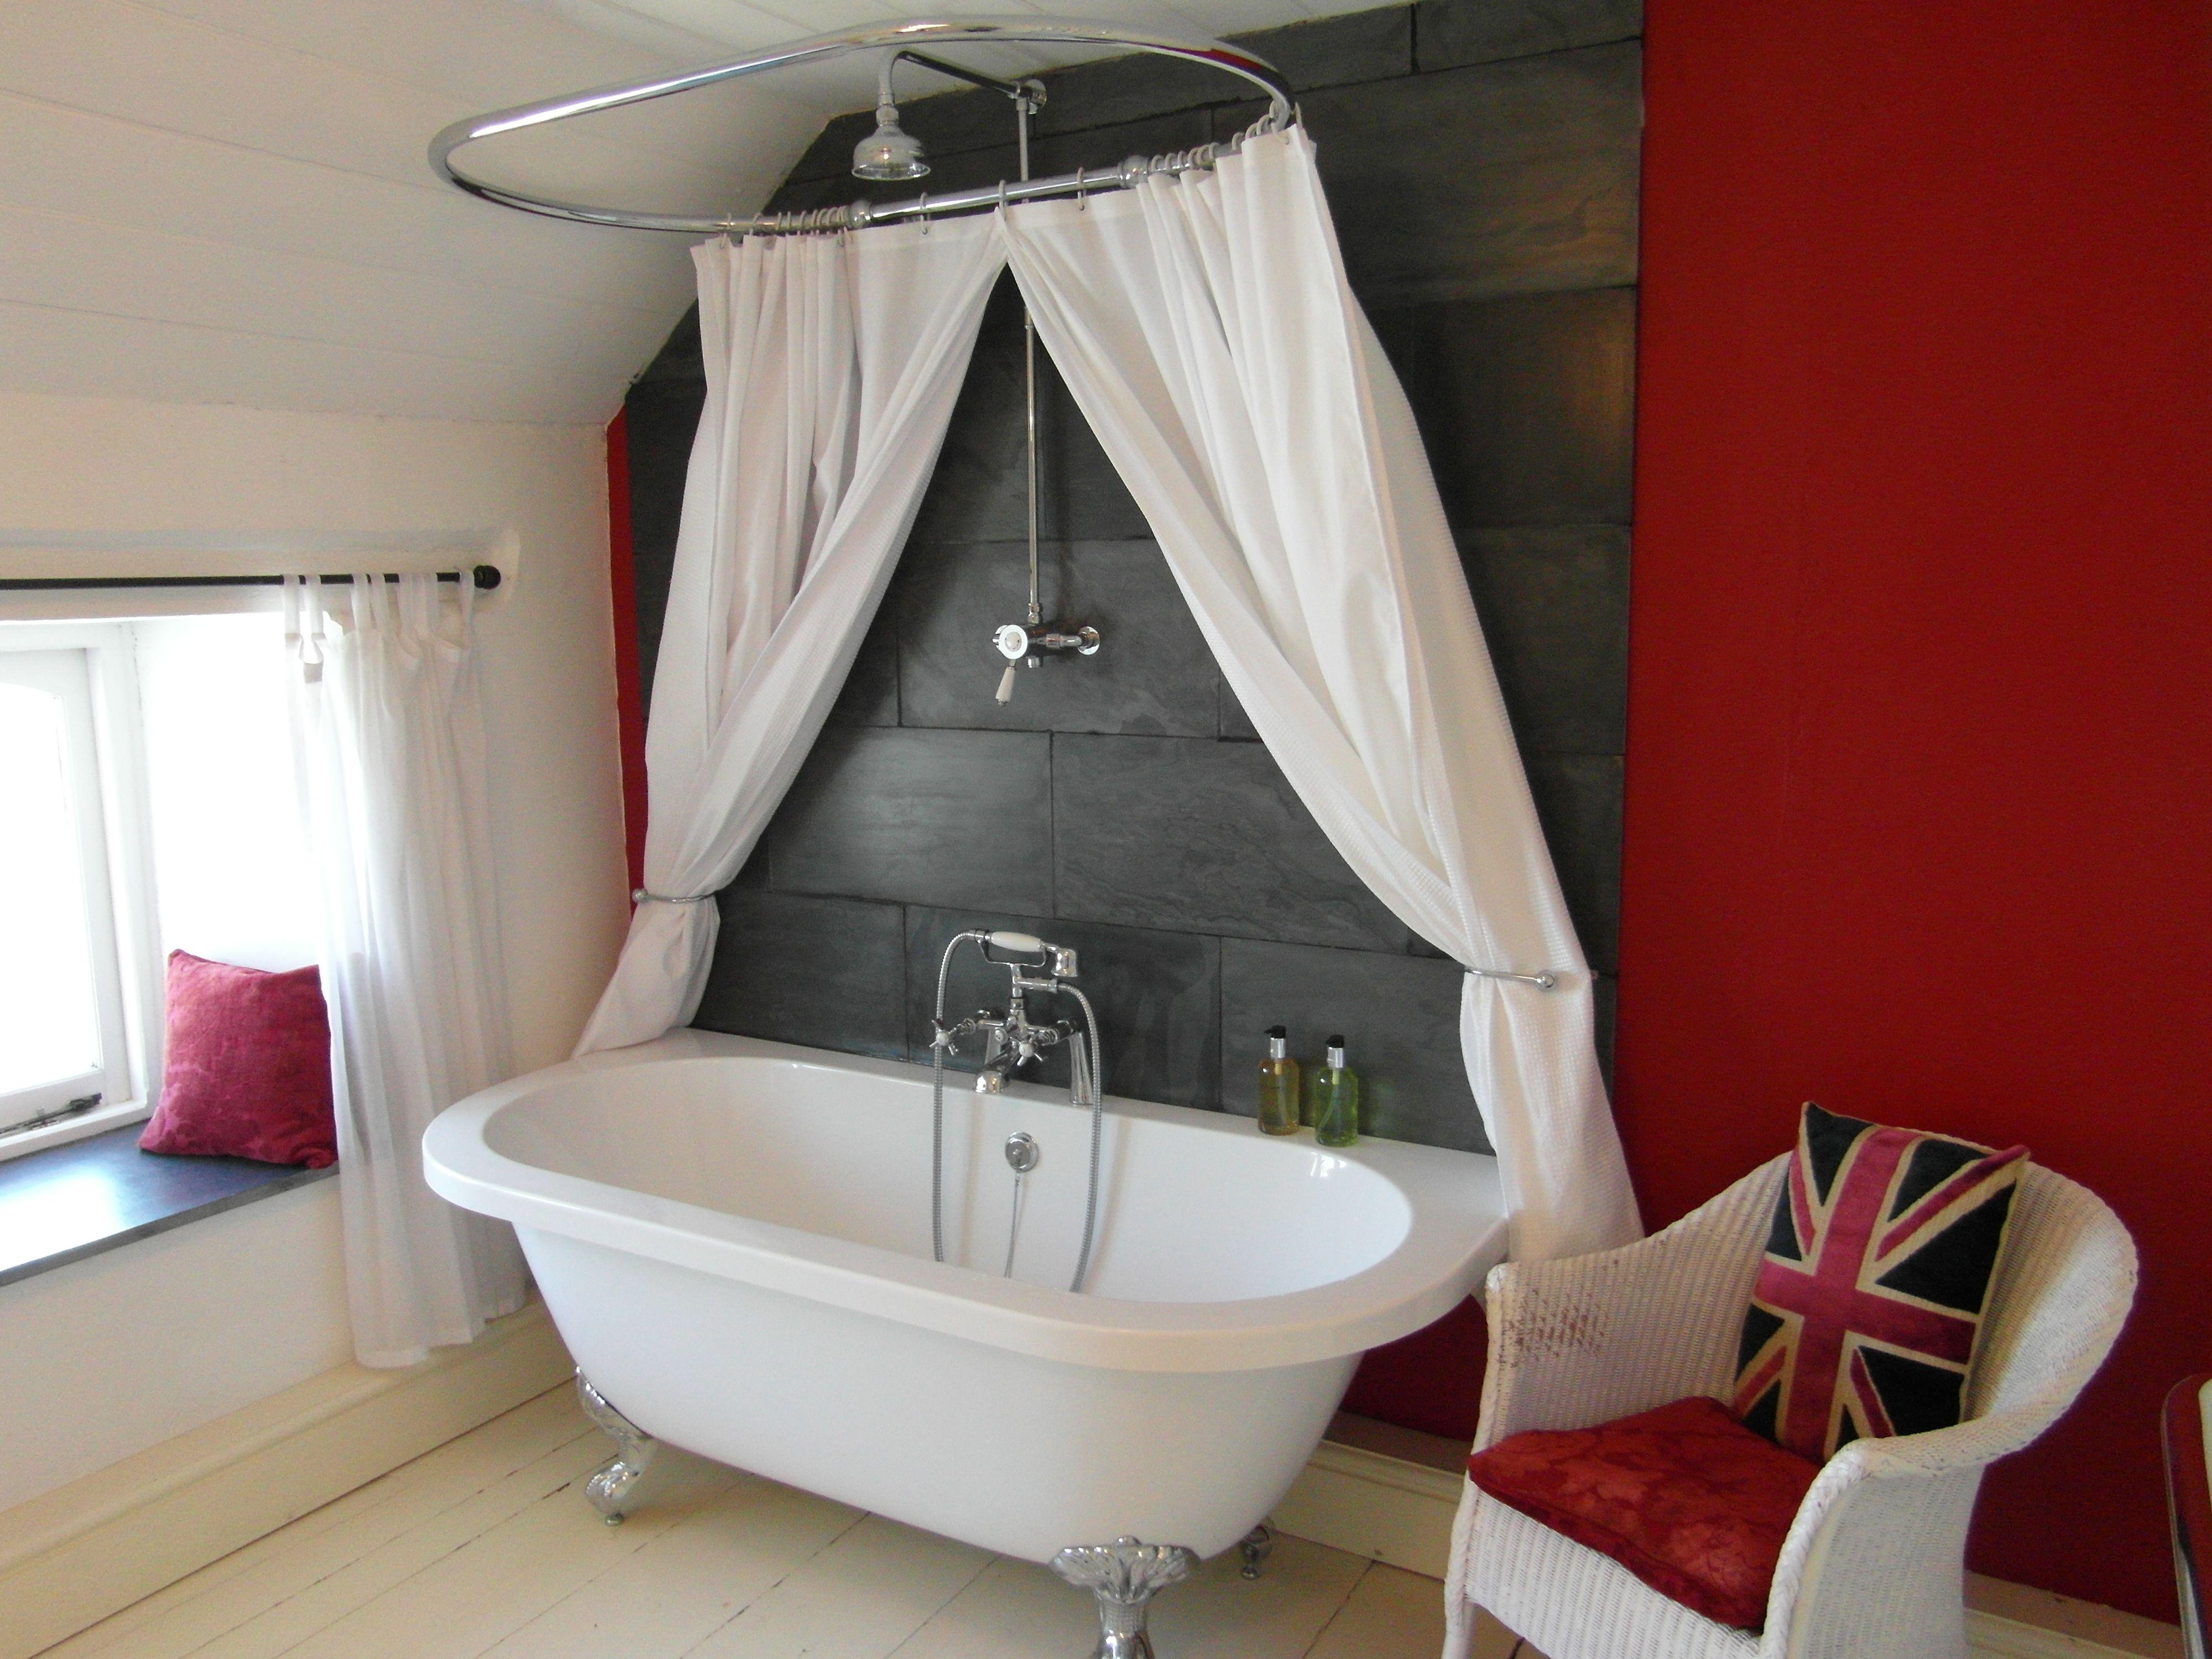 Luxury Bathroom Ideas Uk luxury bathroom with rolltop bath and rainhead shower over. the